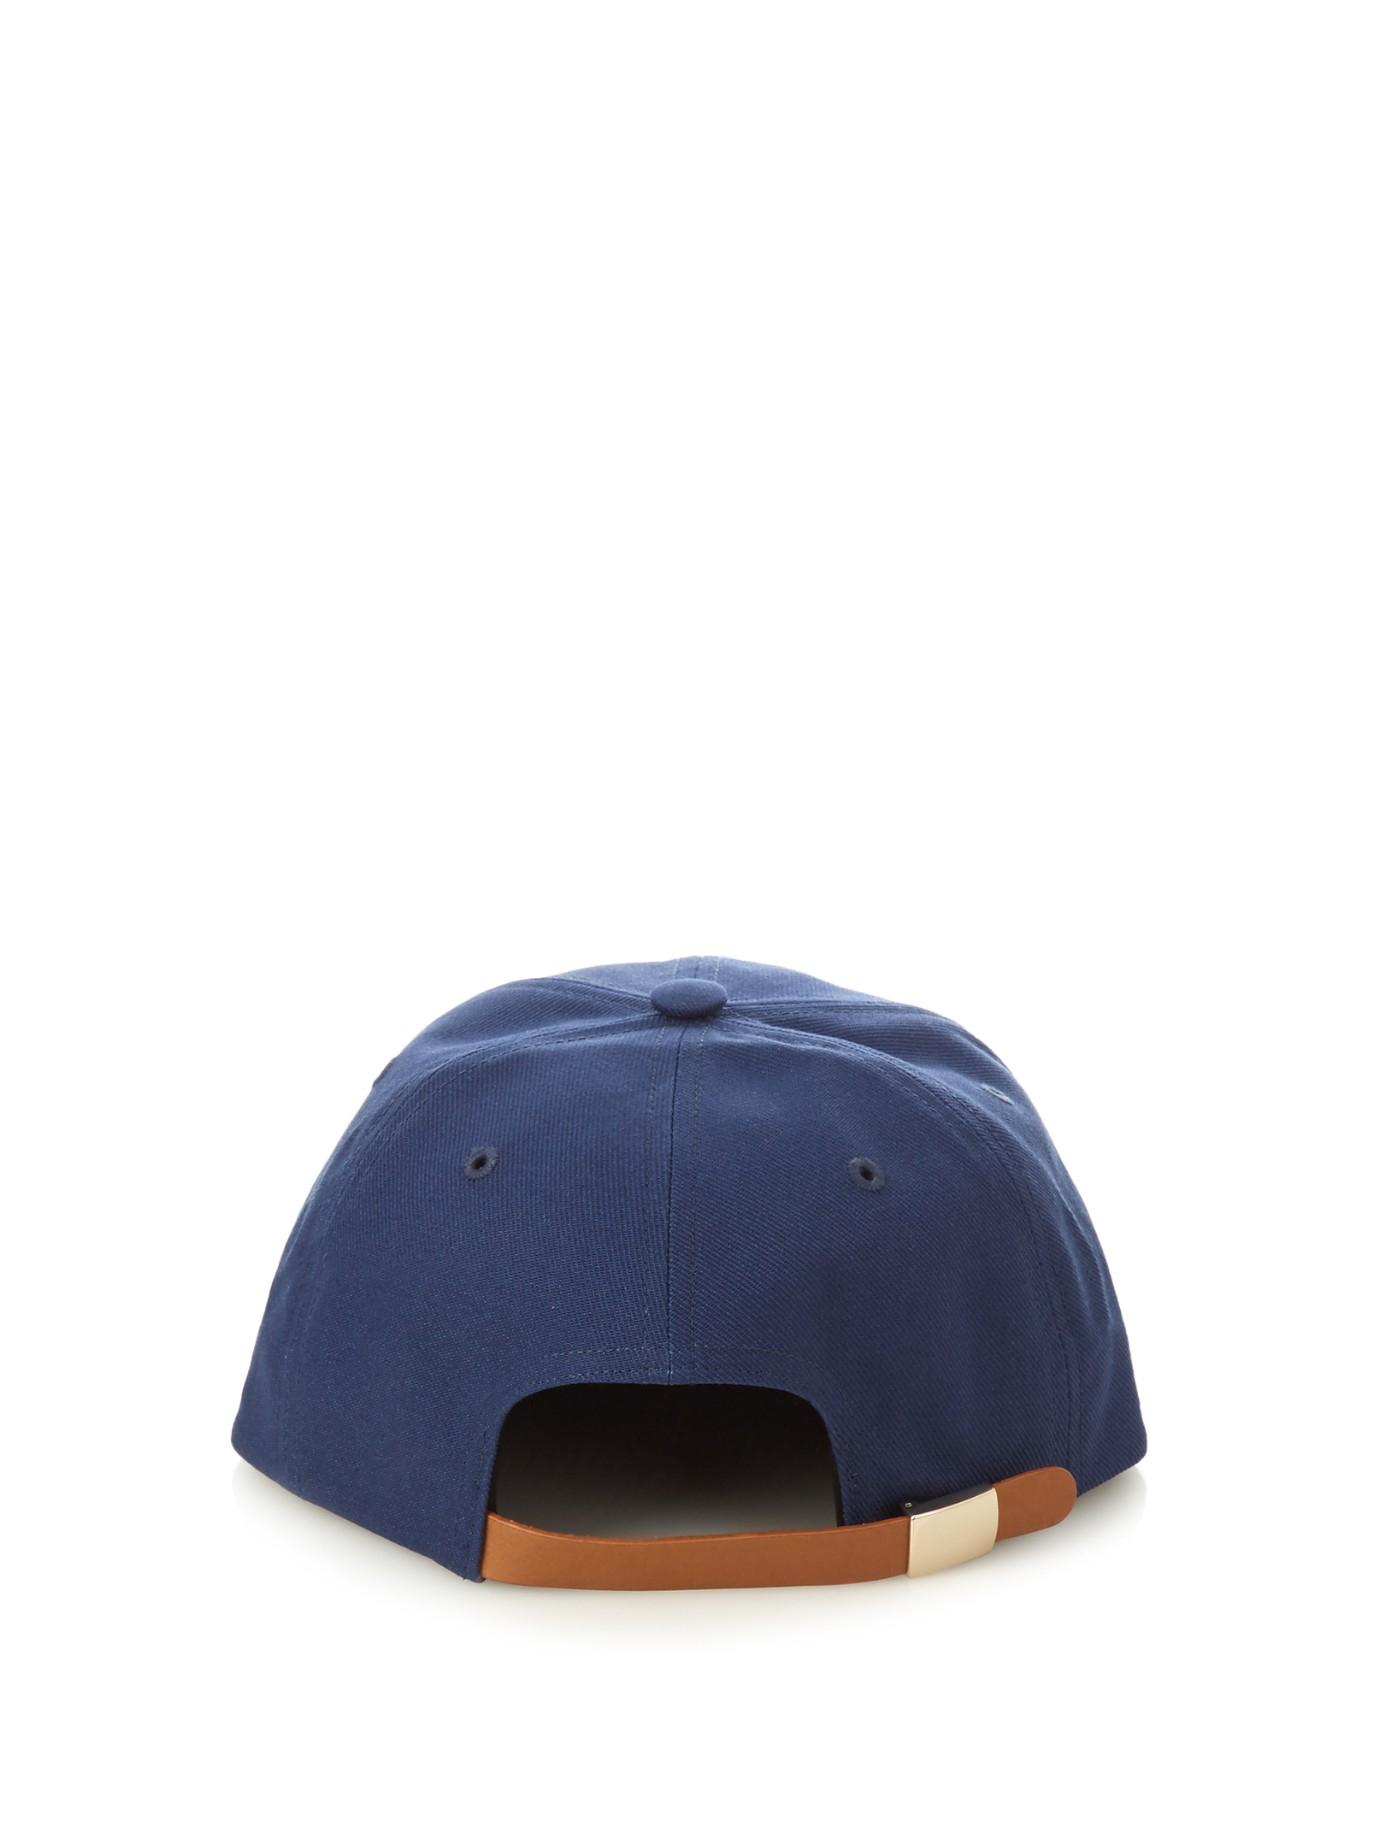 a54def1e072a2d Maison Kitsuné Logo-embroidered Baseball Cap in Blue for Men - Lyst